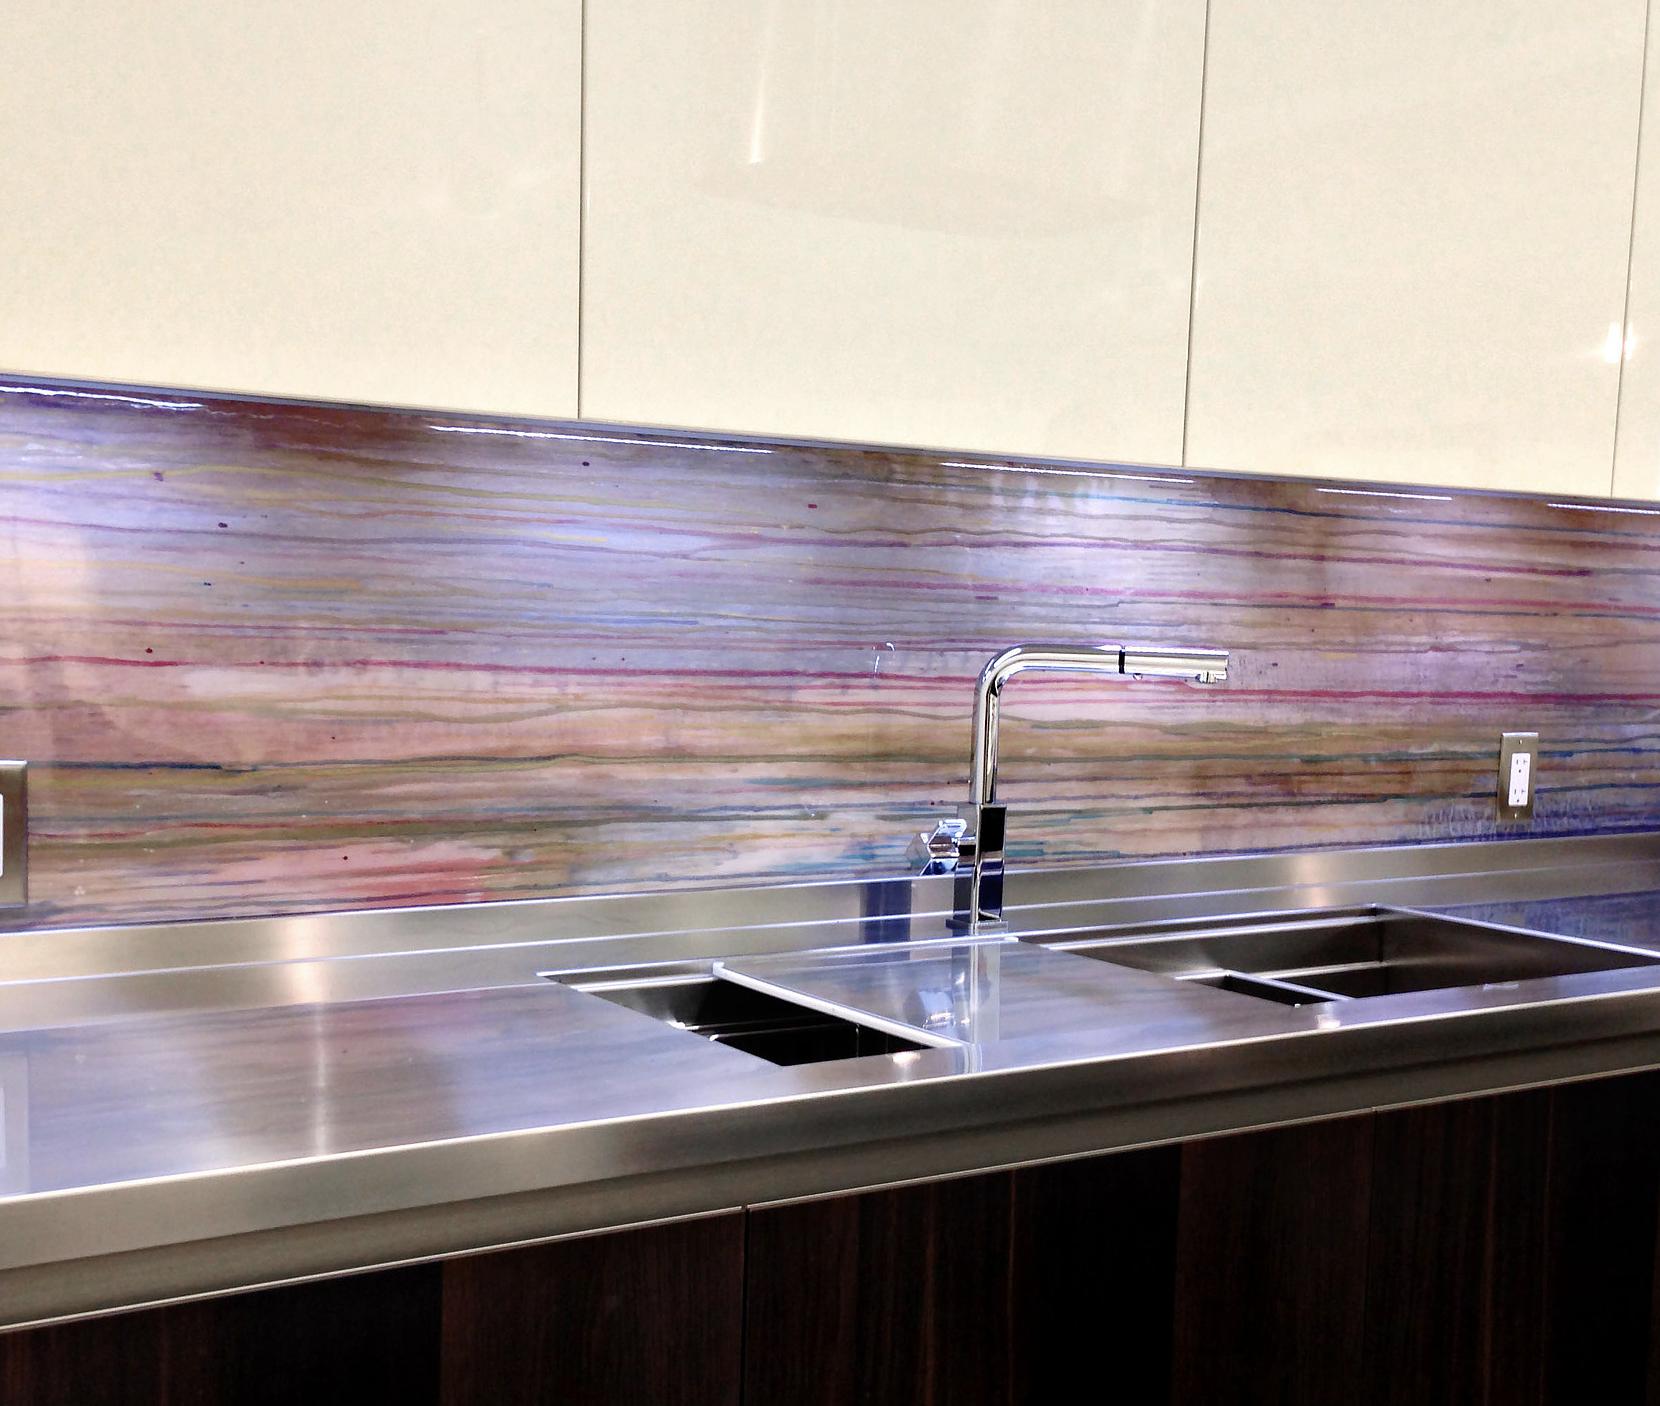 Acrylic Colors Resin Aluminum Art Panel Backsplash Studium Farmhouse Backsplash Backsplash Cheap Backsplash Tile